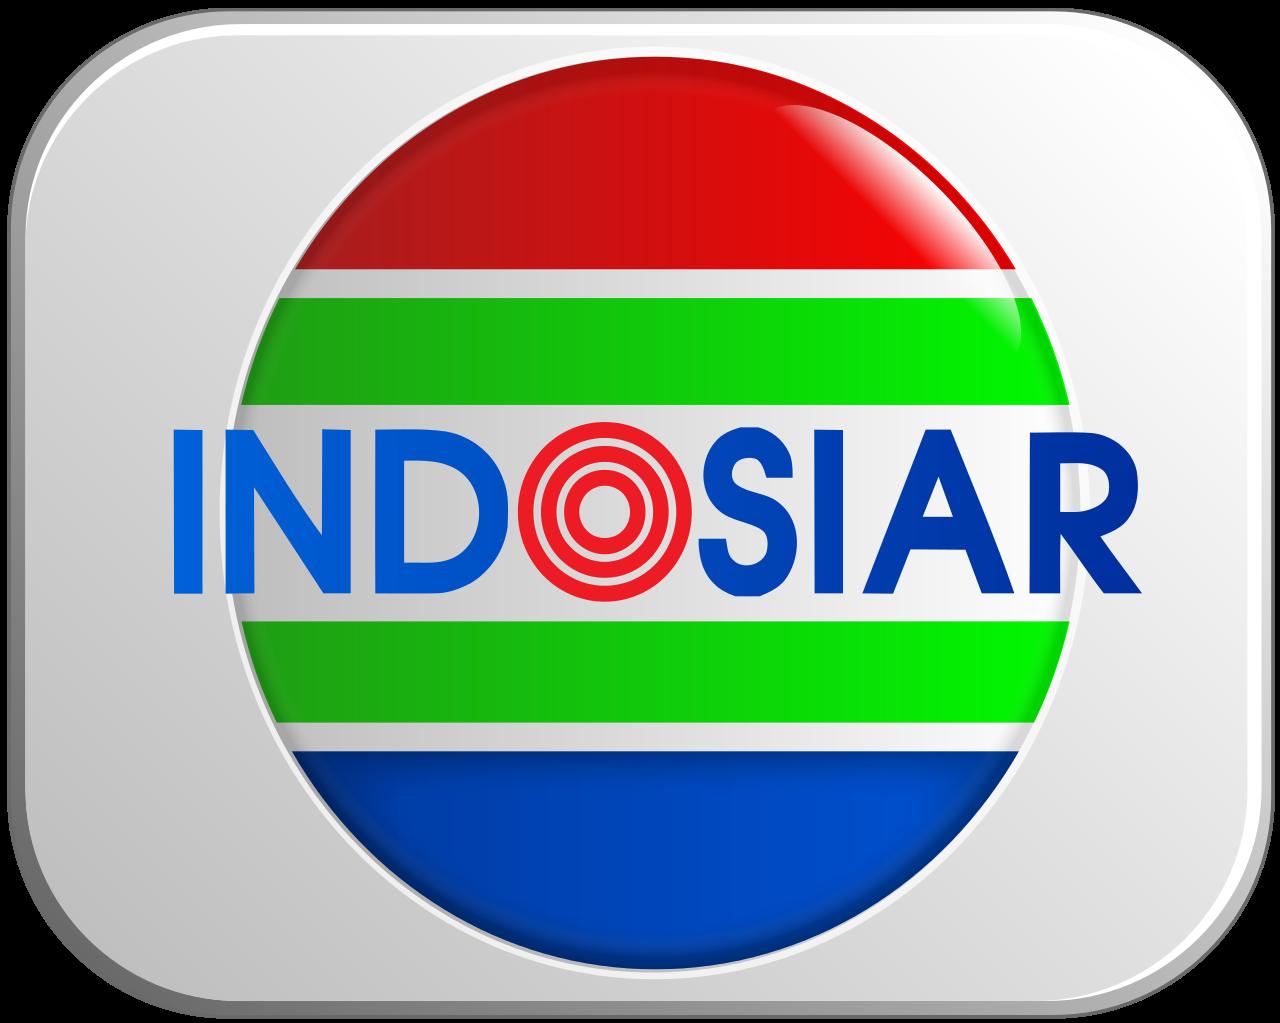 Indosiar Streaming Facebook: Gambar Logo Stasiun Televisi Di Indonesia